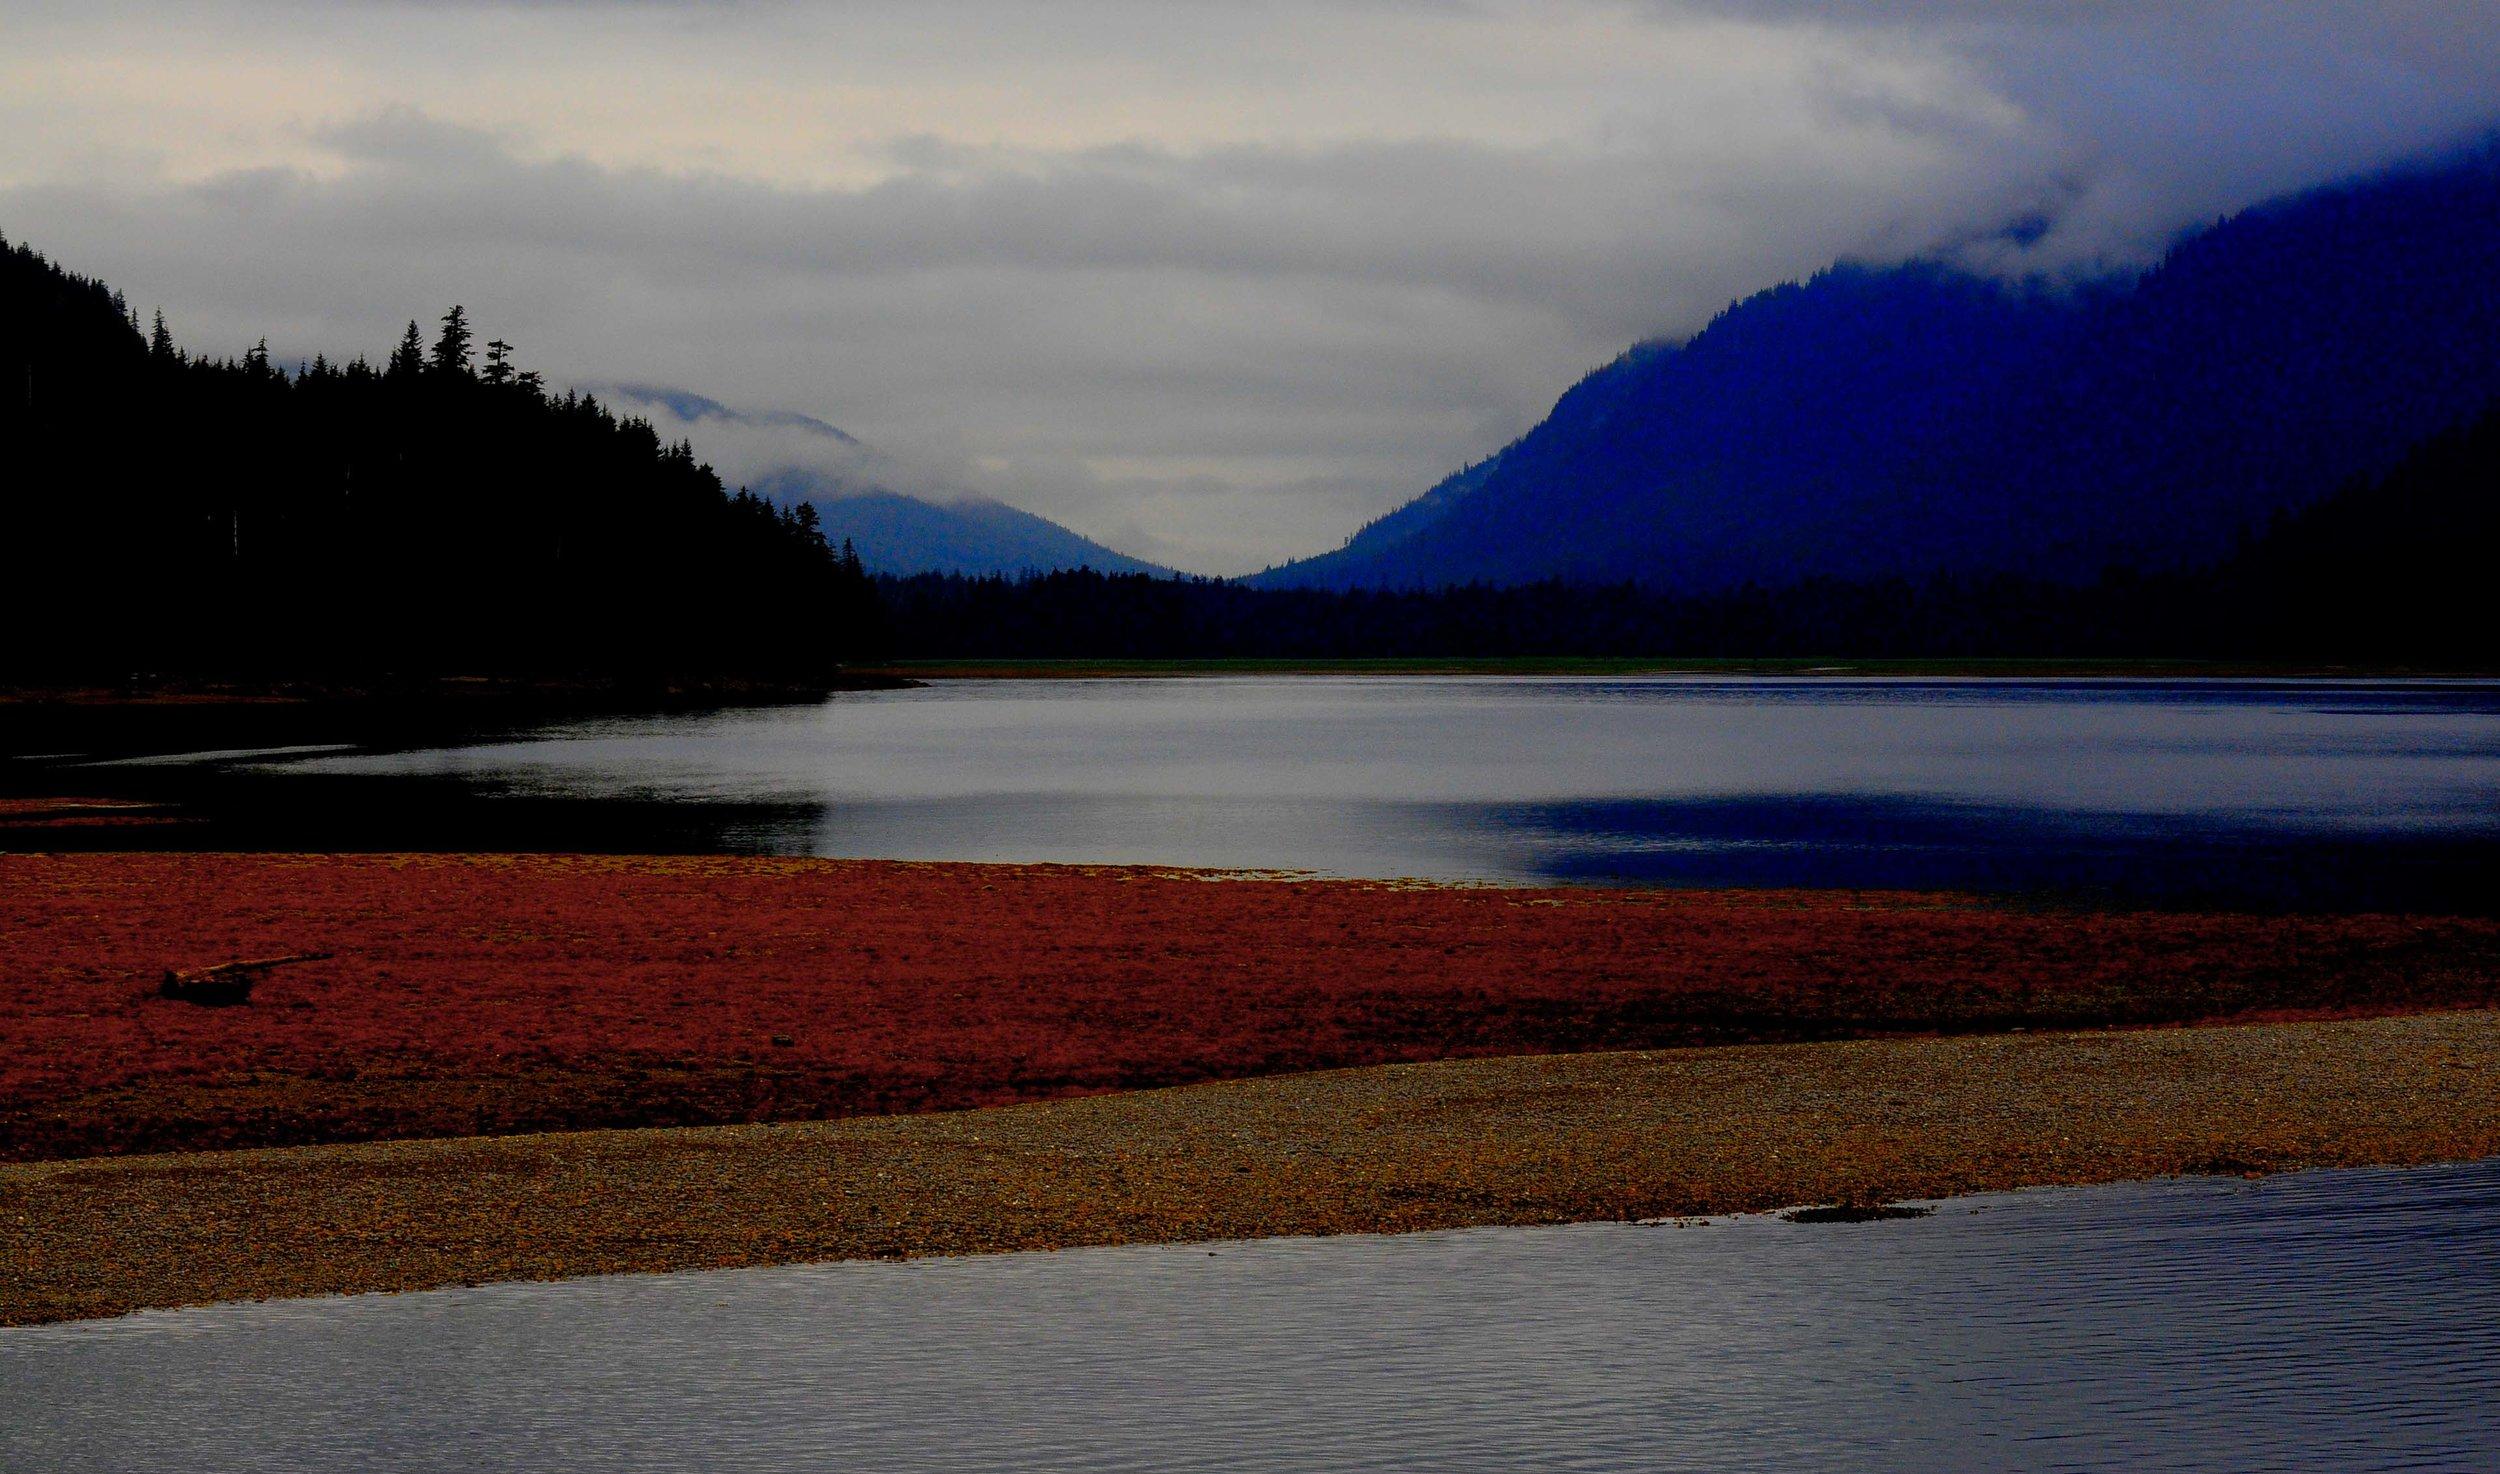 Inside Passage, Alaska 2011